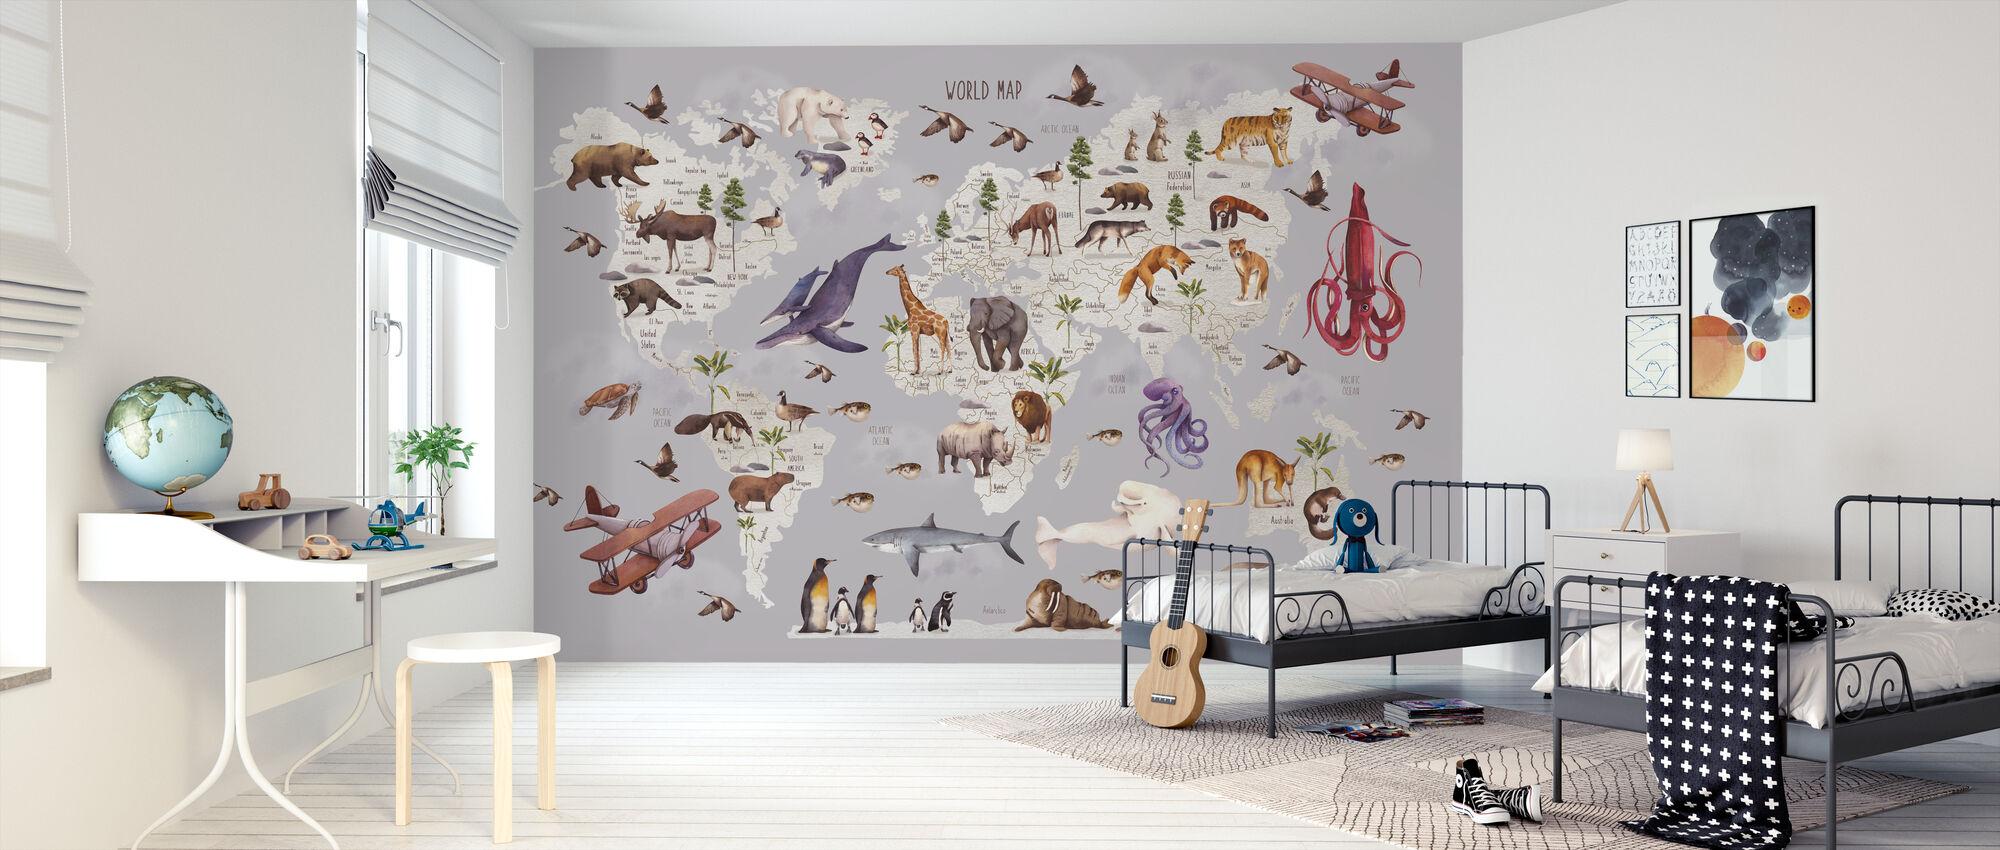 Animal World Map - Wallpaper - Kids Room